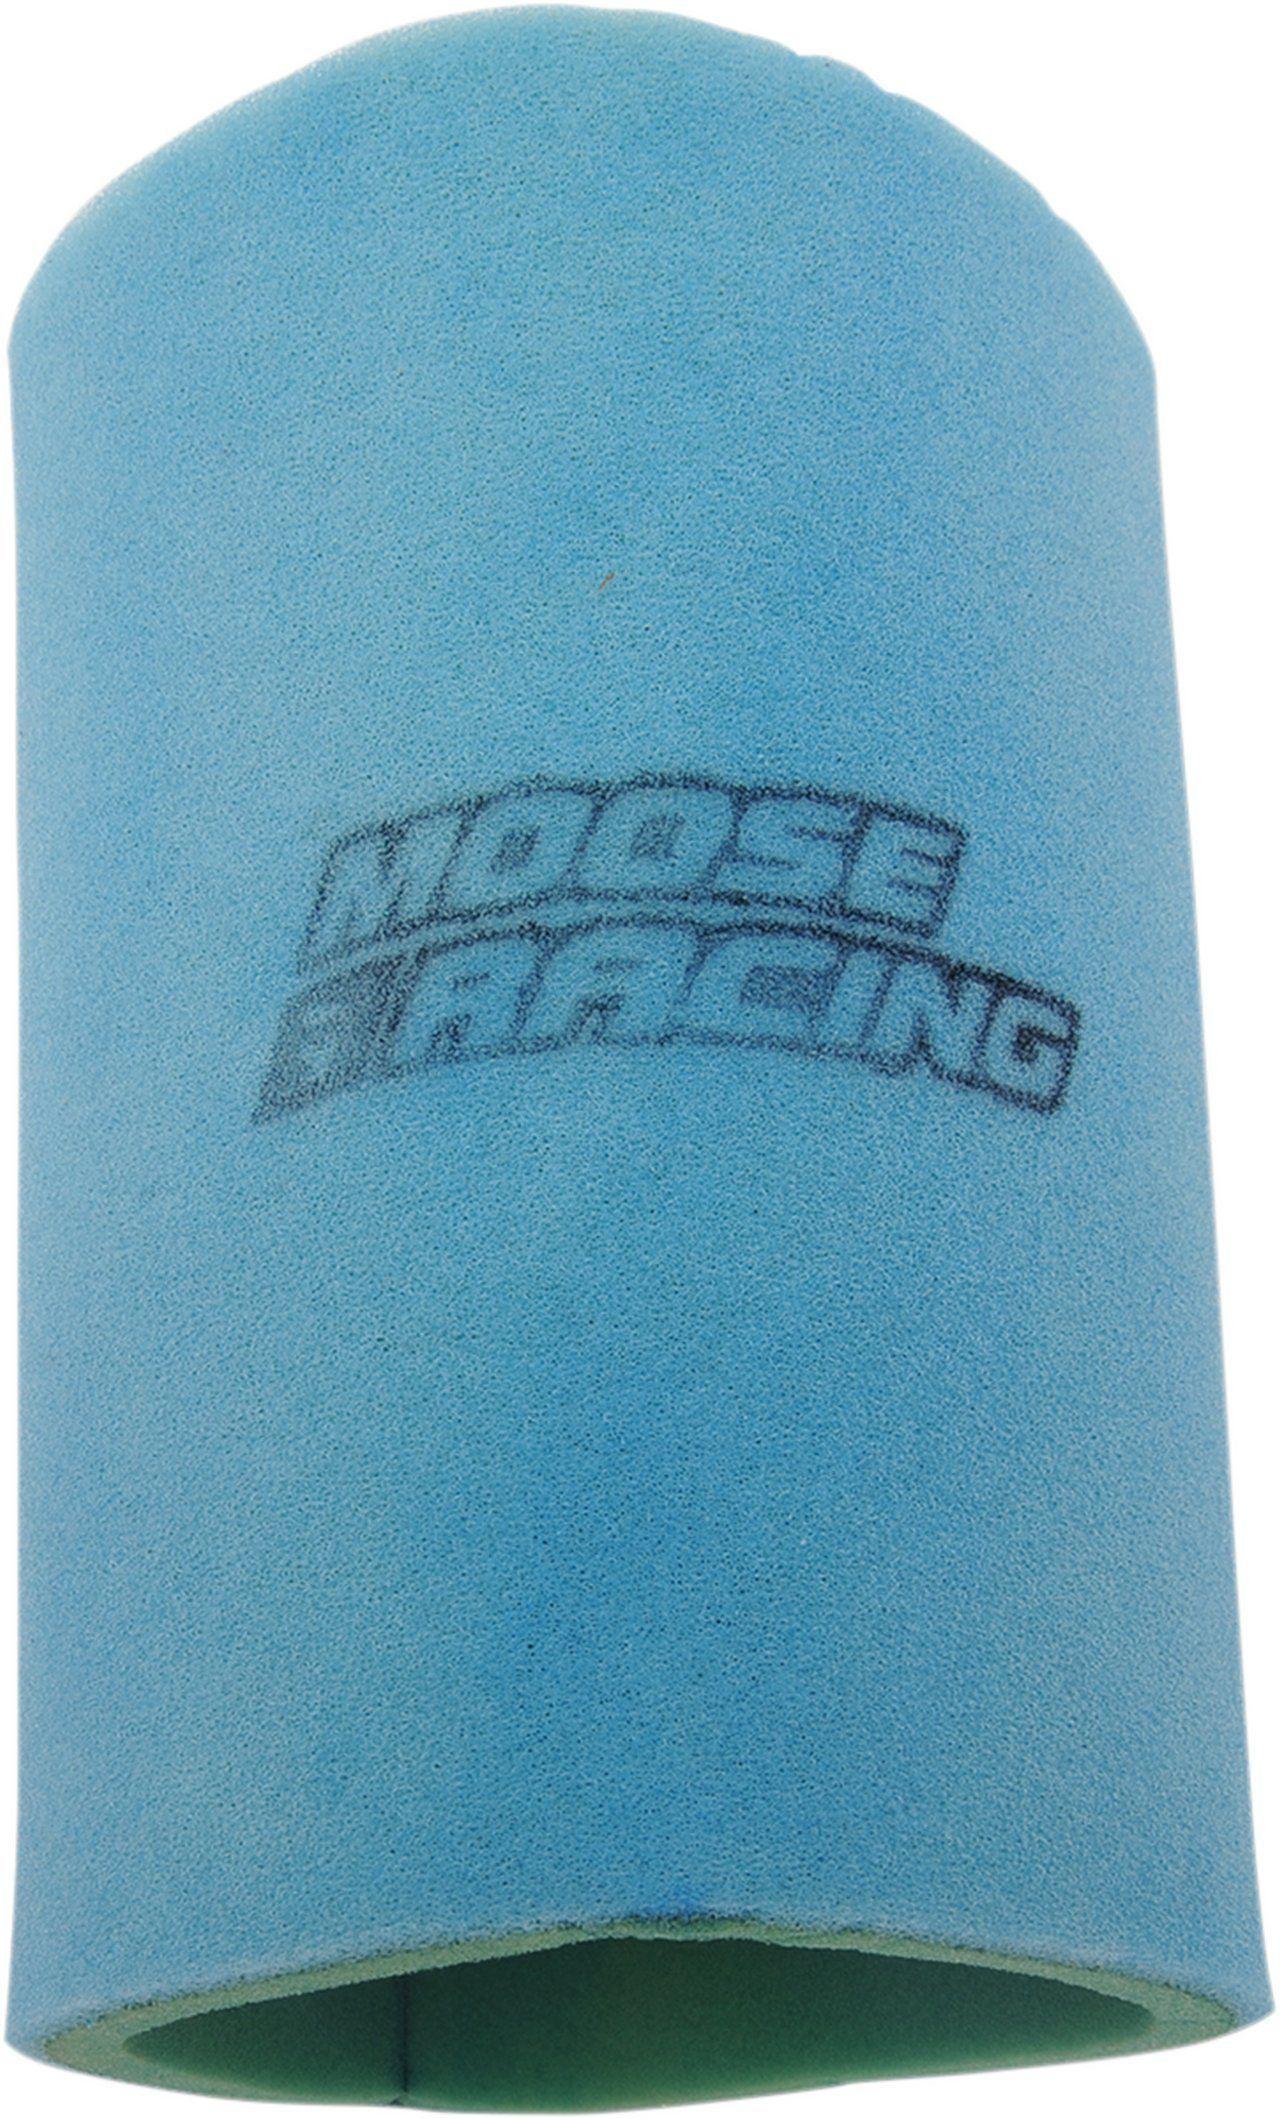 【MOOSE RACING】PPO (PRECISION PRE-OILED) 空氣濾芯 [1011-3333] - 「Webike-摩托百貨」